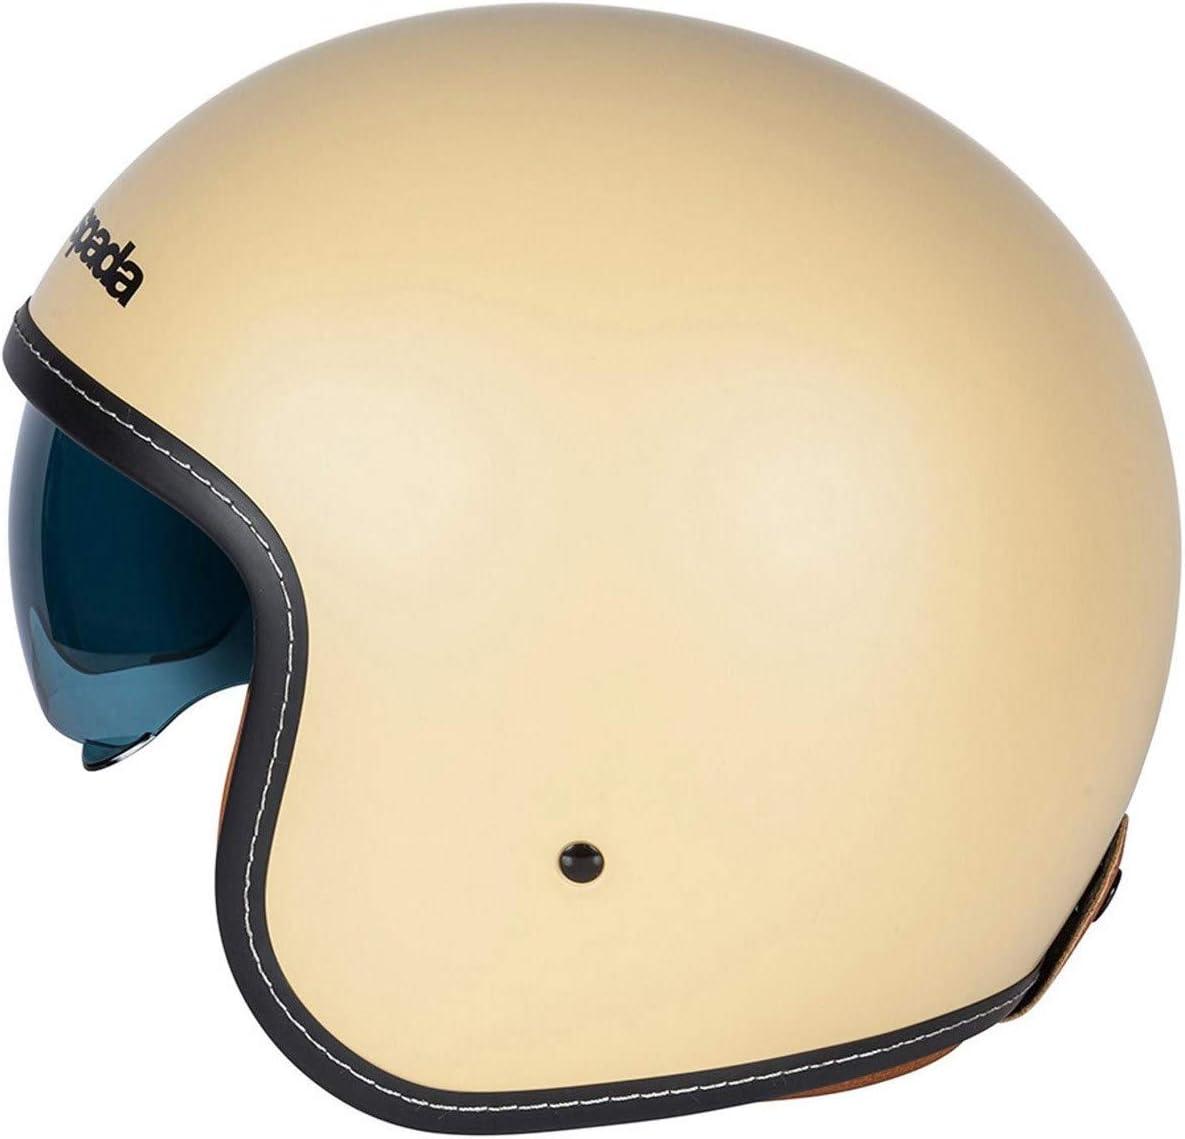 Sand//Tan Spada Raze Sandanista Motorcycle Motorbike Open Face Helmet